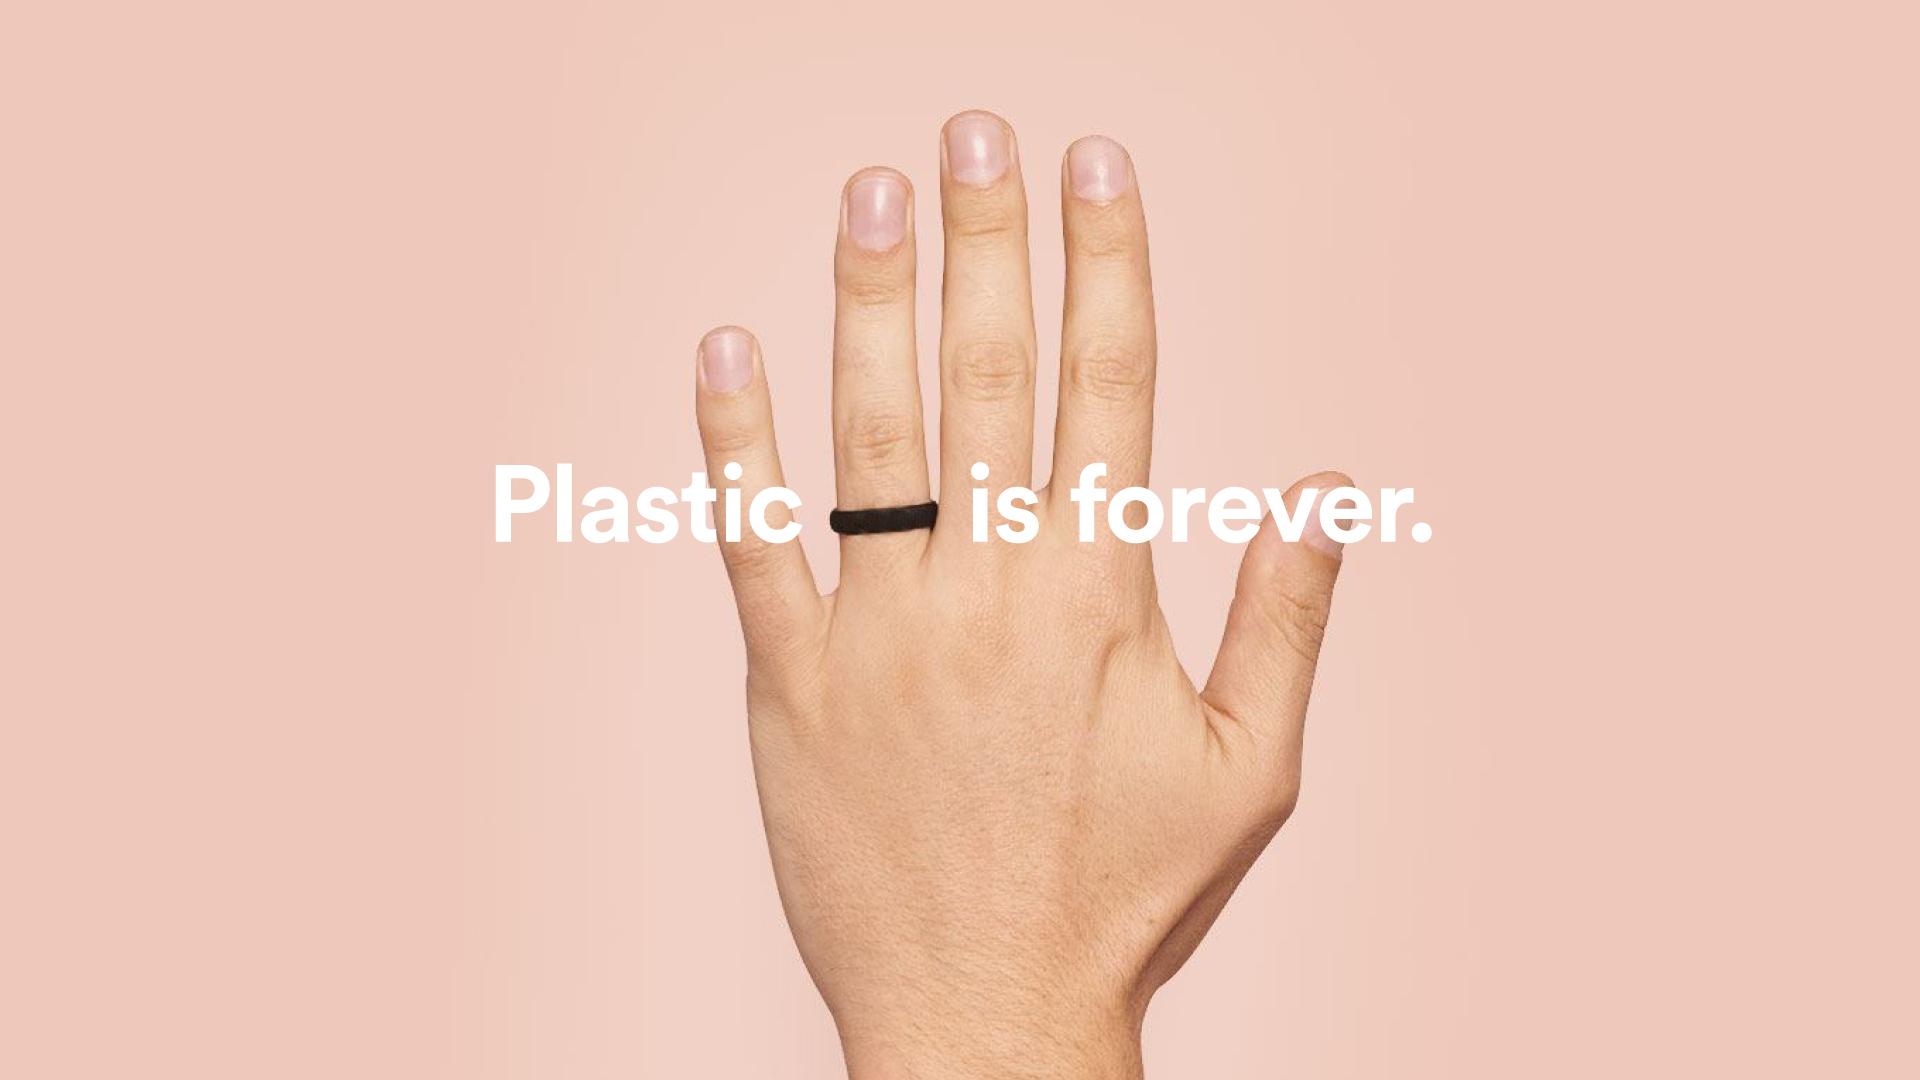 Plastic_1920x1080px.jpg